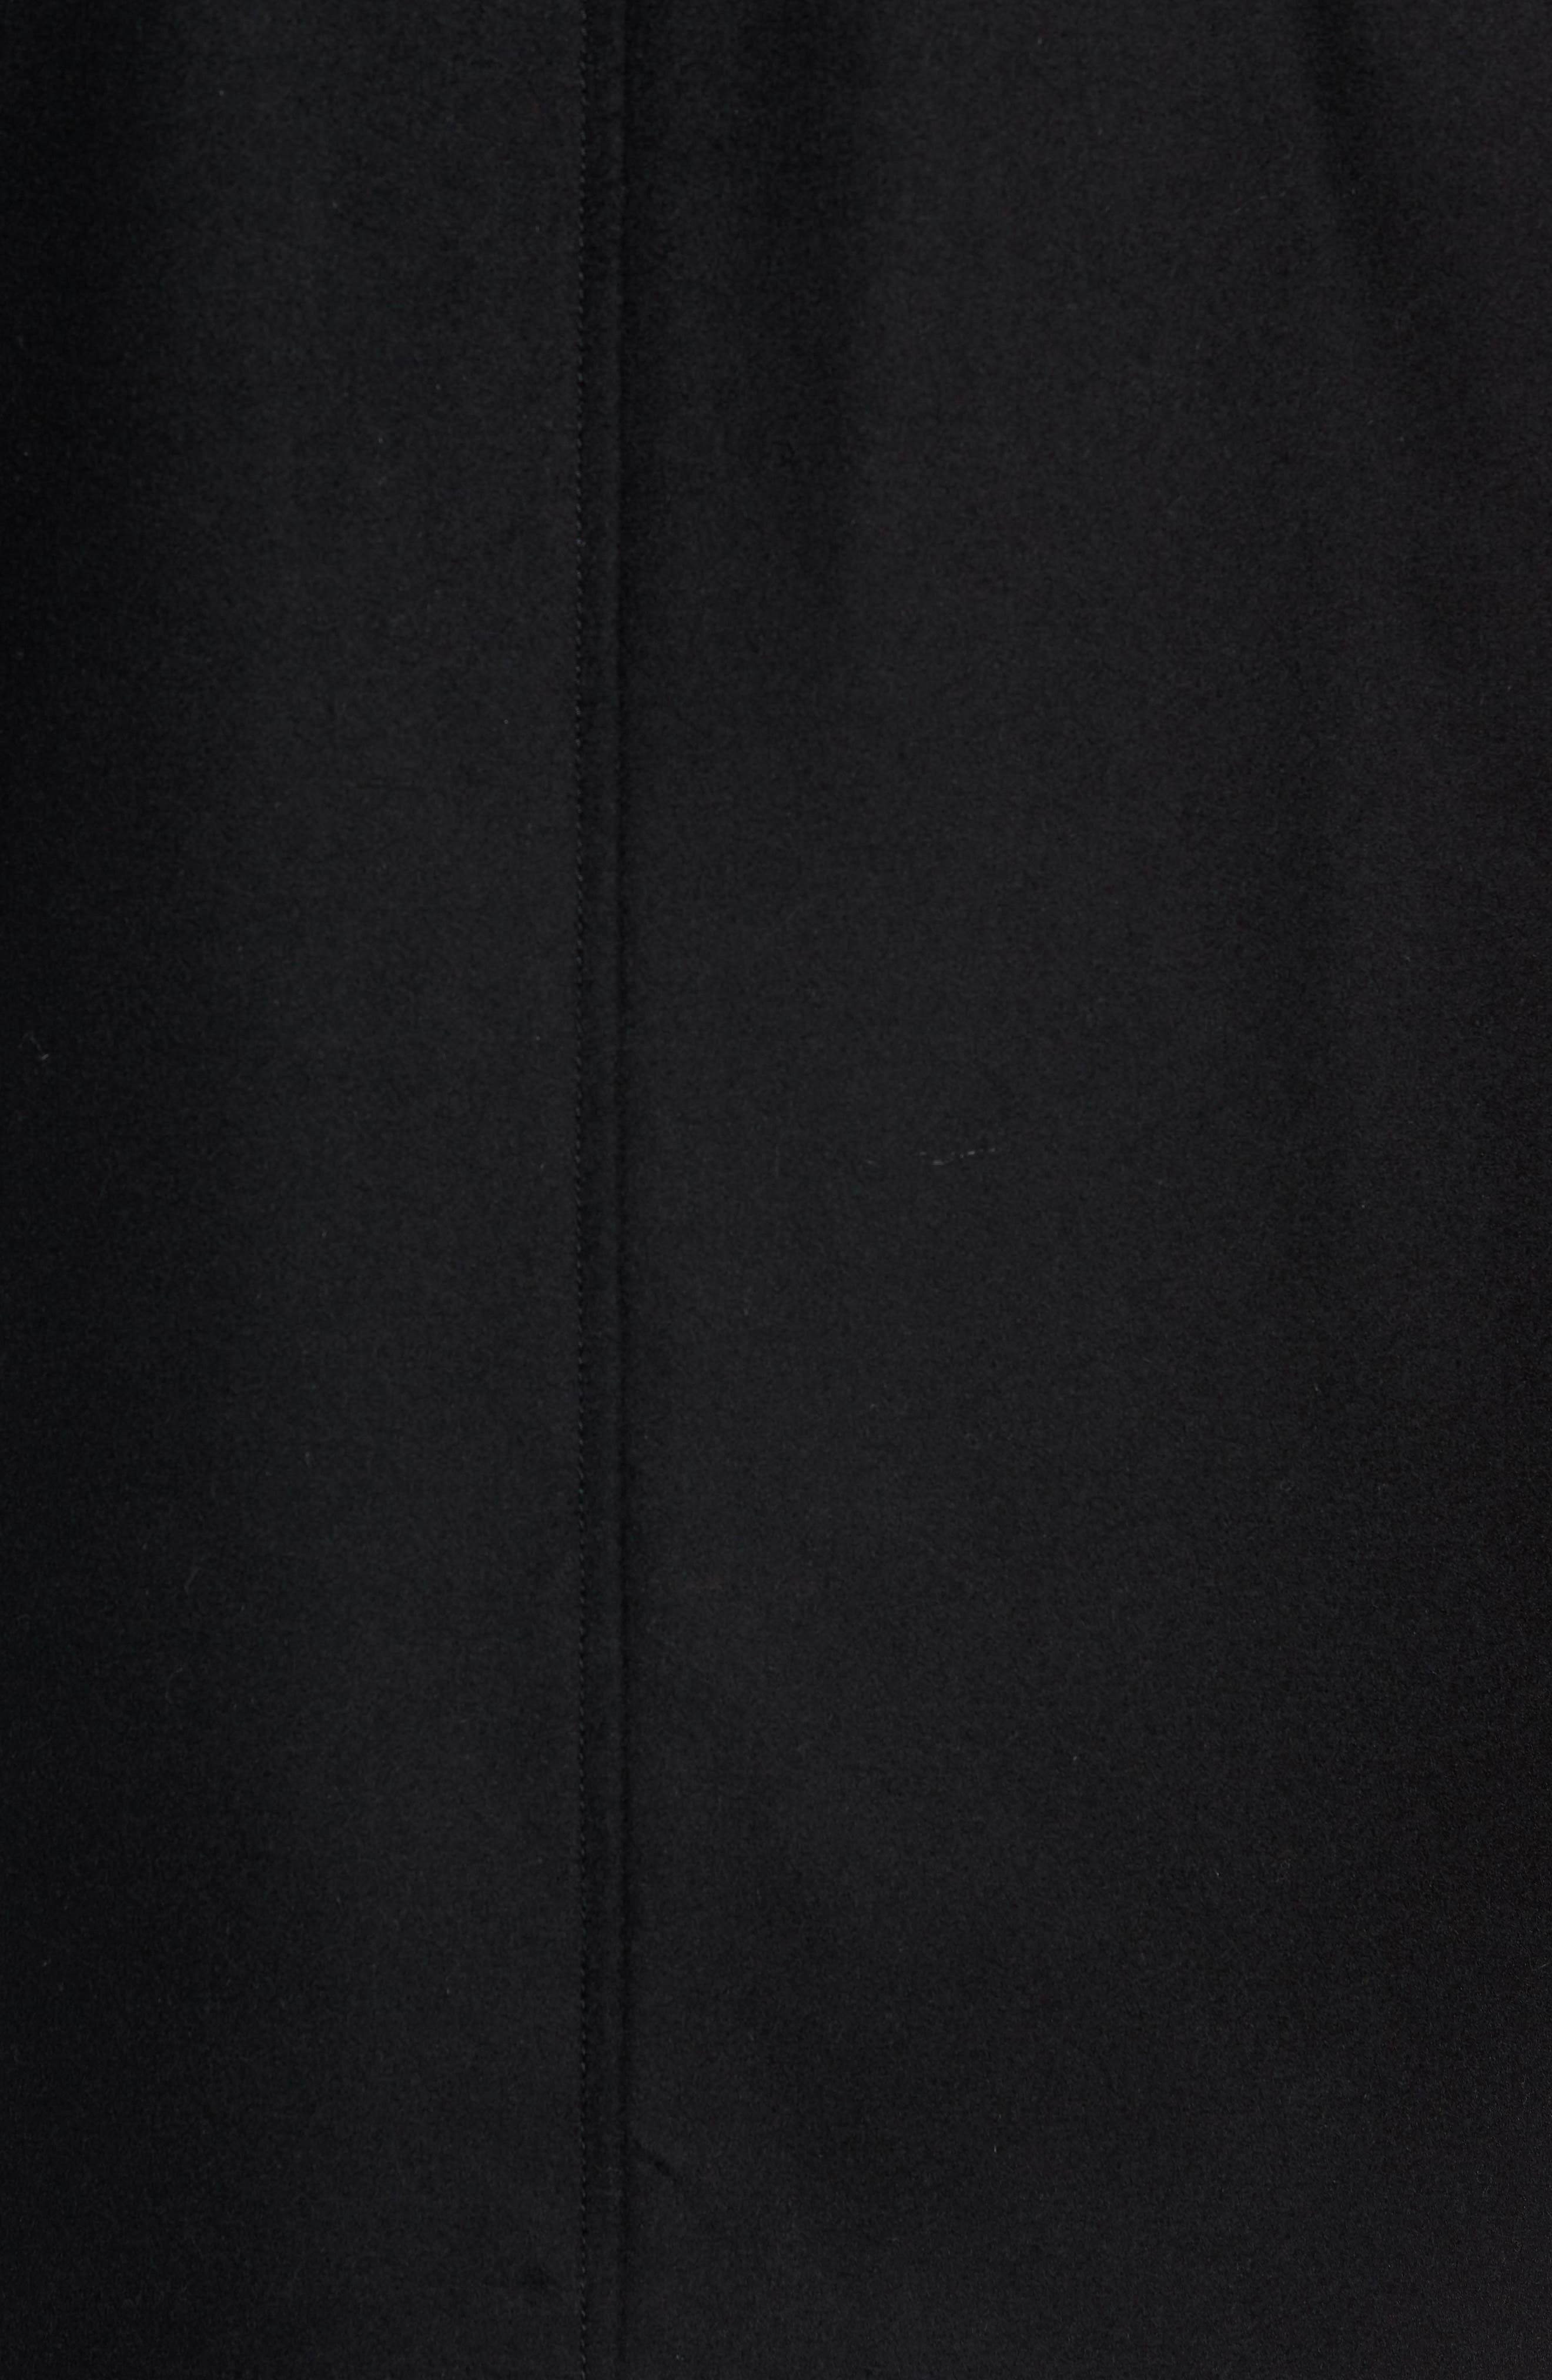 Coxtan Wool Regular Fit Car Coat,                             Alternate thumbnail 7, color,                             BLACK